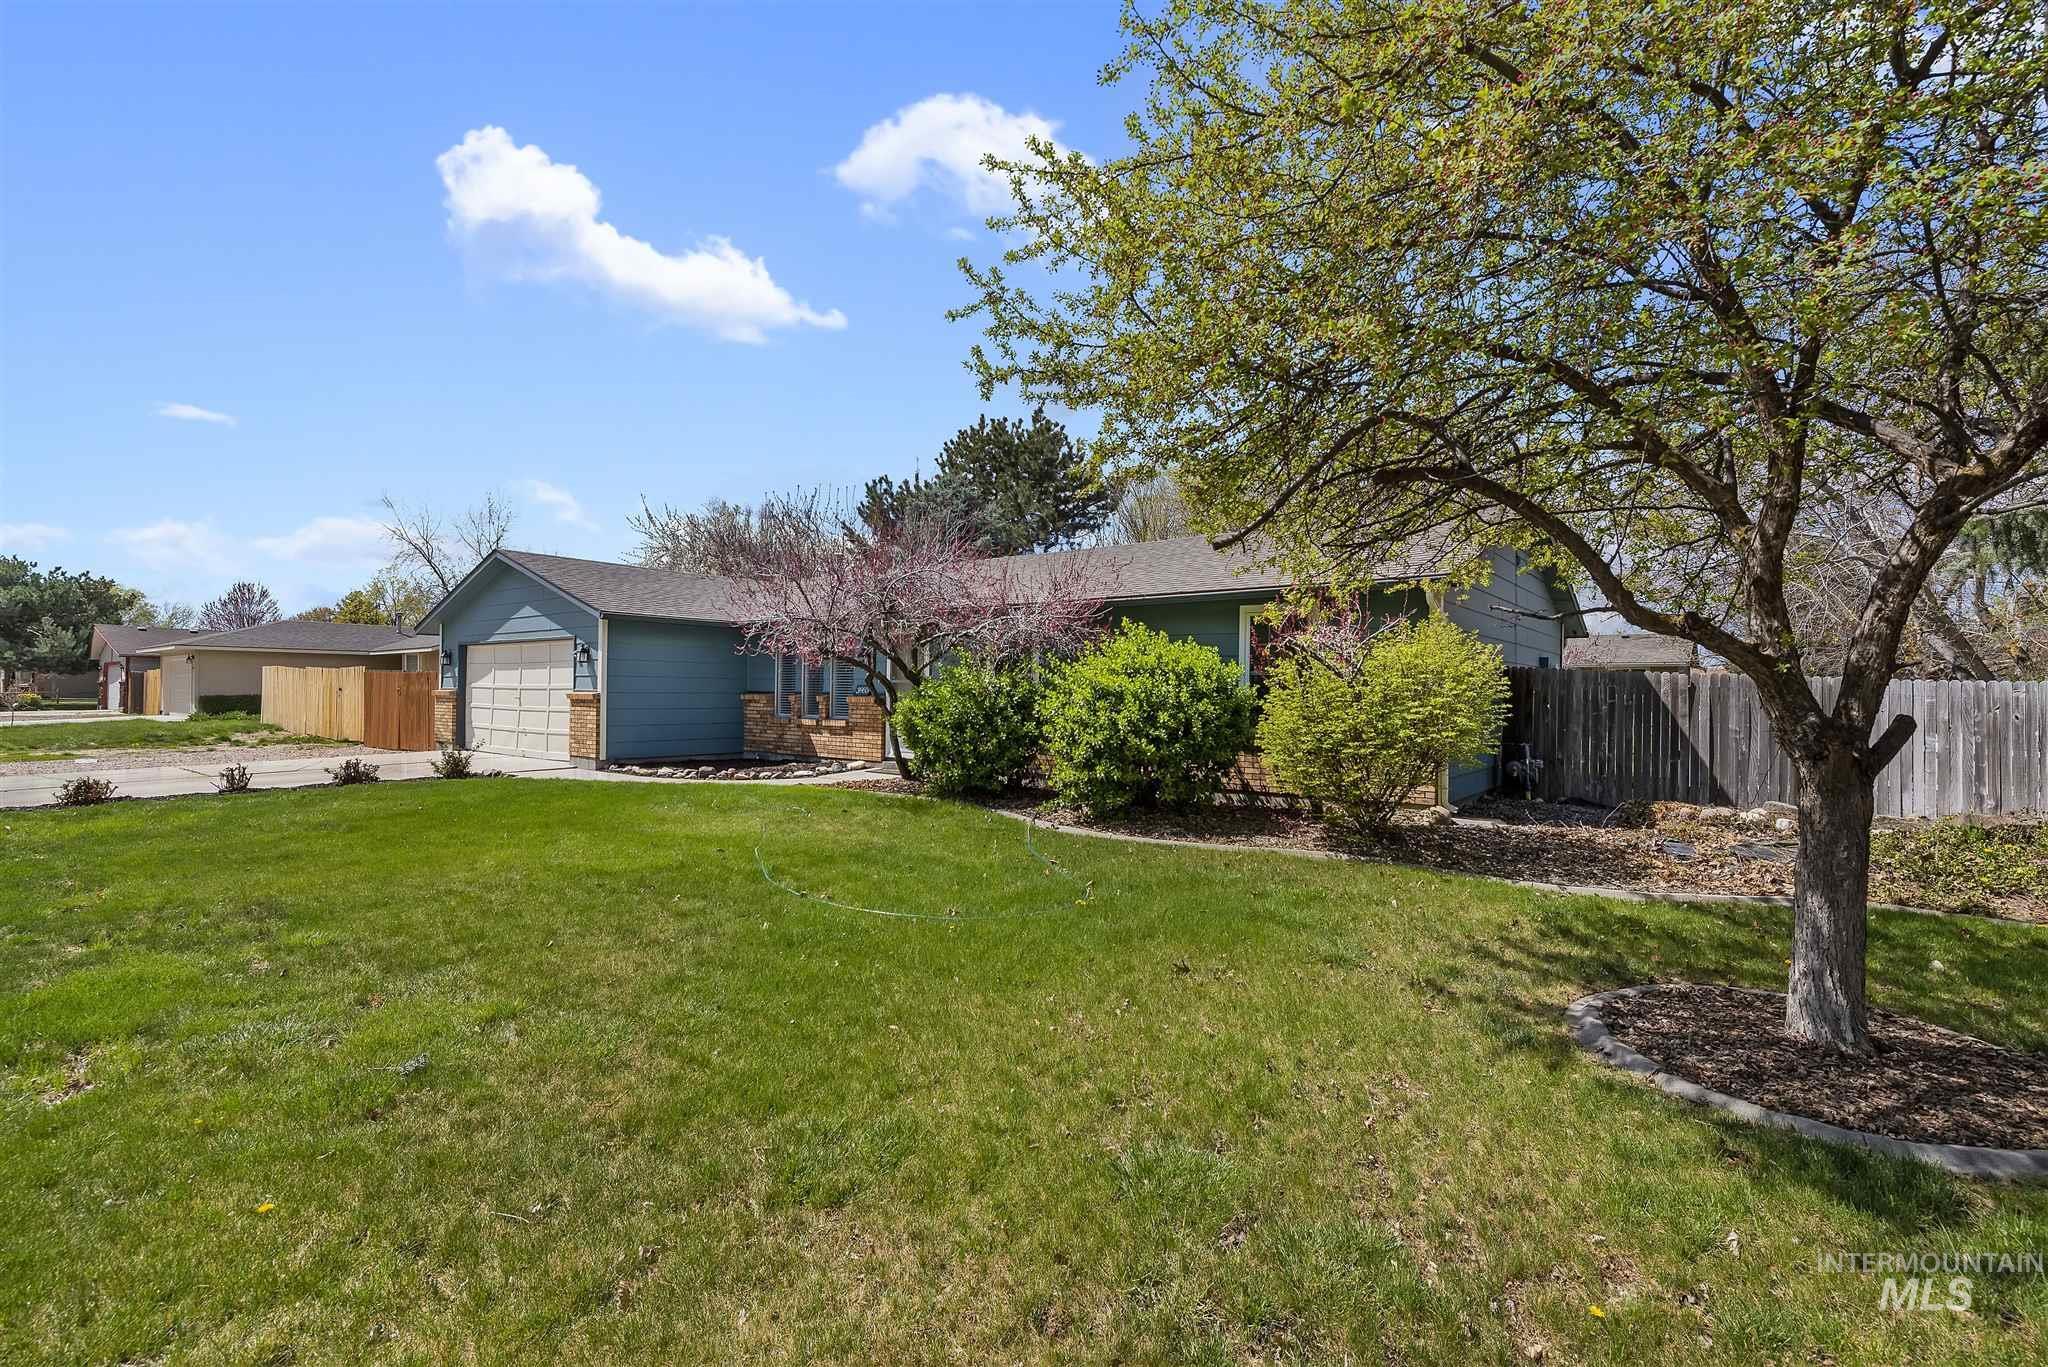 3985 N Shamrock Ave Property Photo - Boise, ID real estate listing